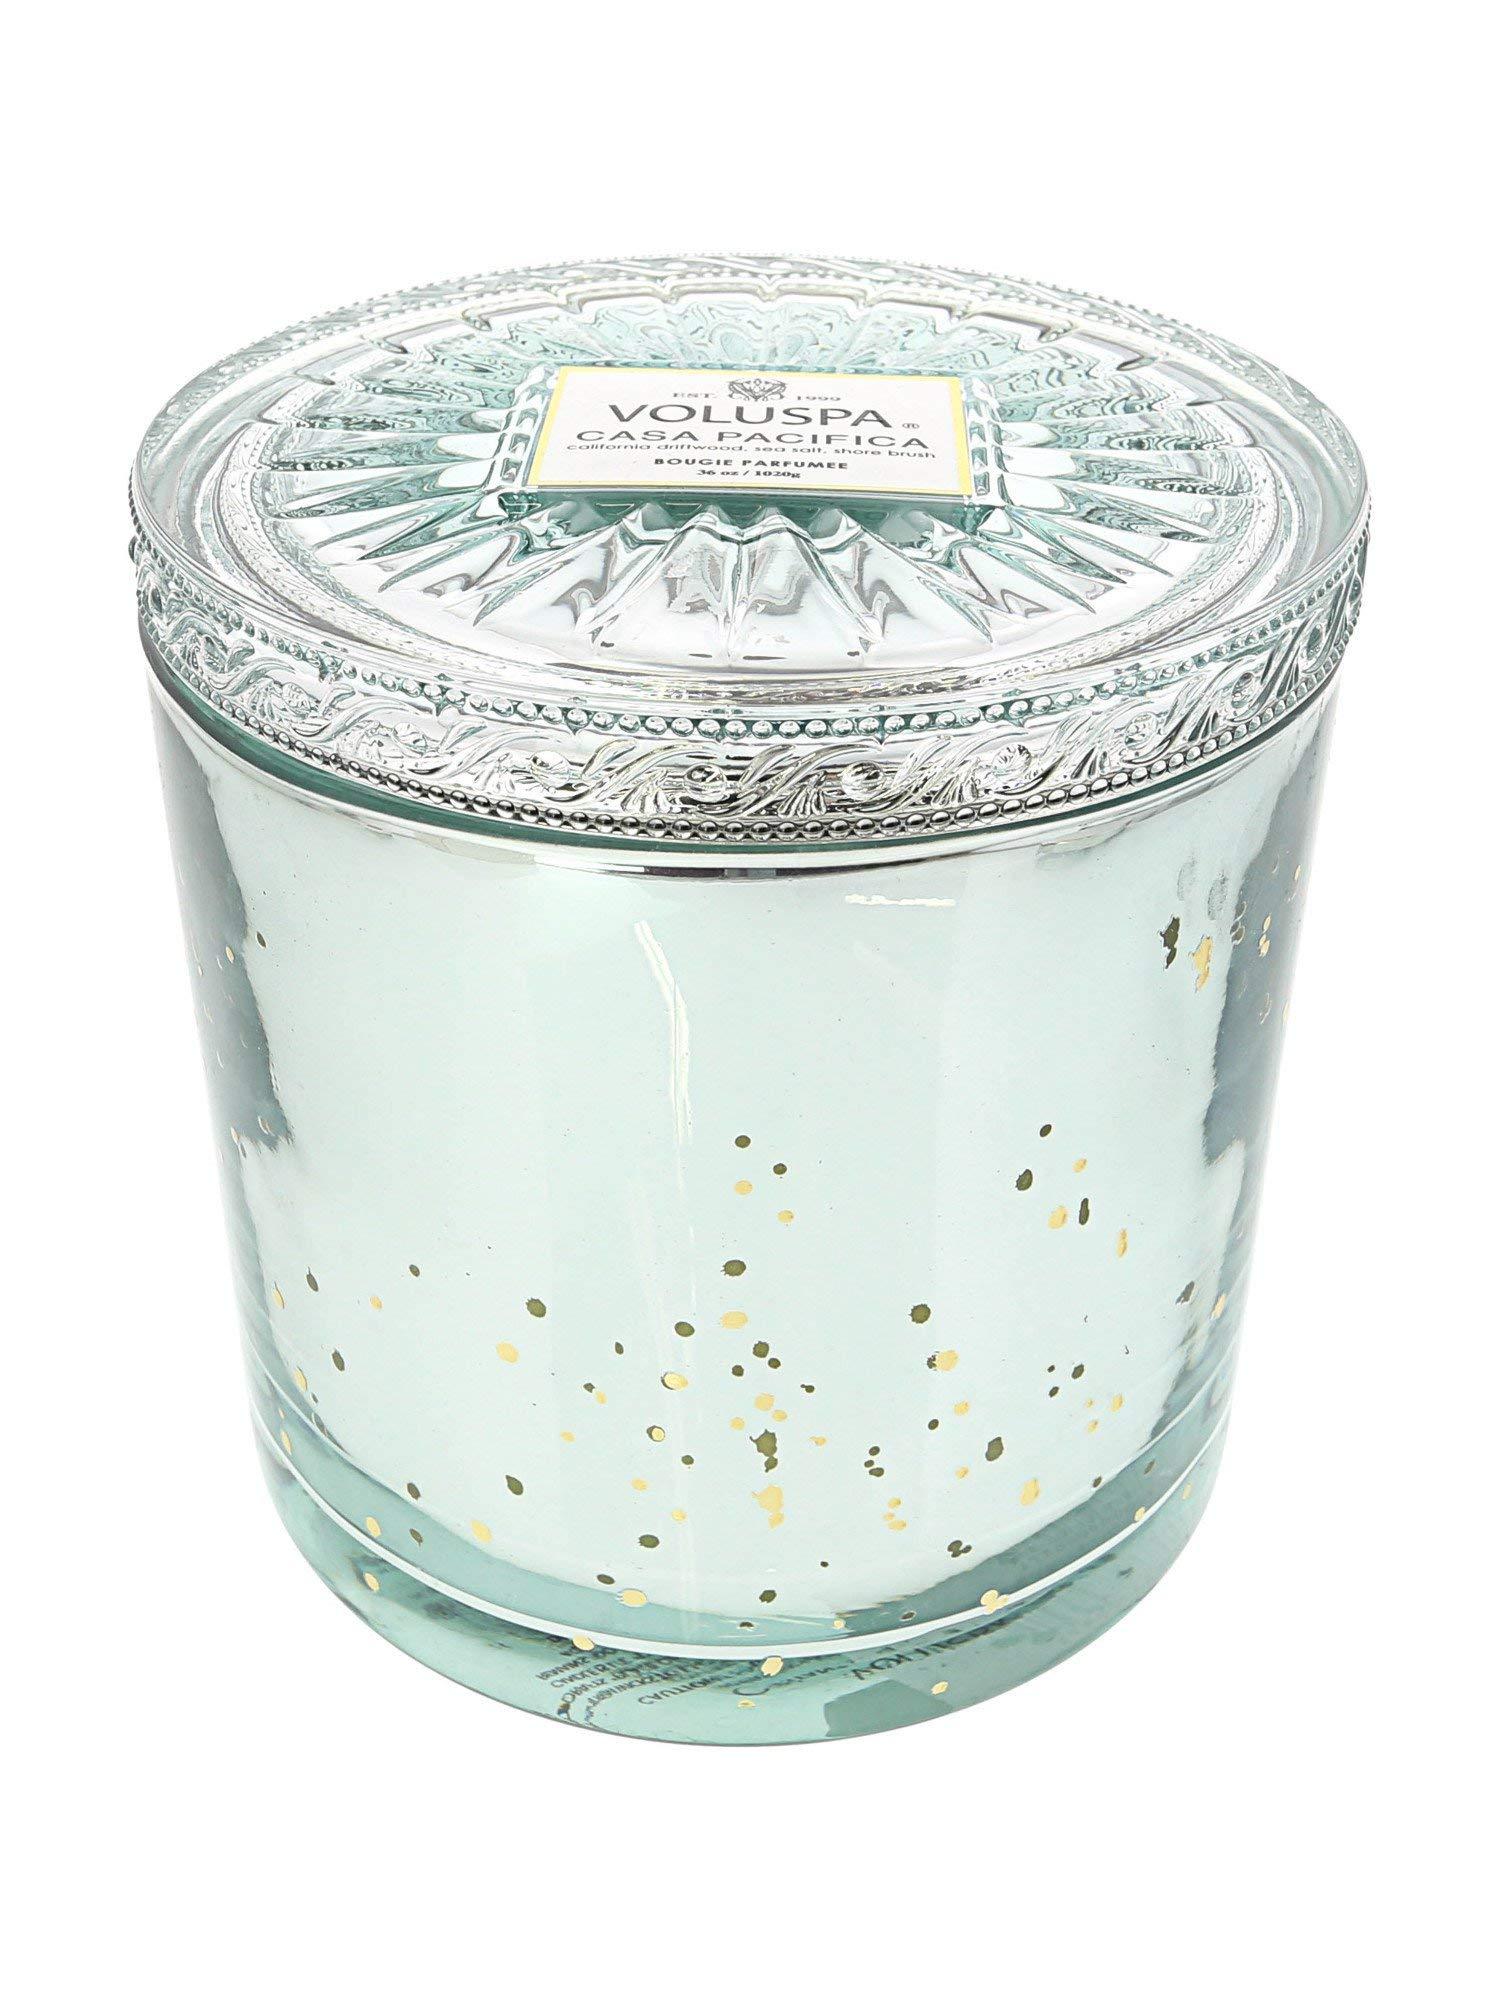 Voluspa Casa Pacifica Grande Maison 3 Wick Glass Candle, 36 ounces